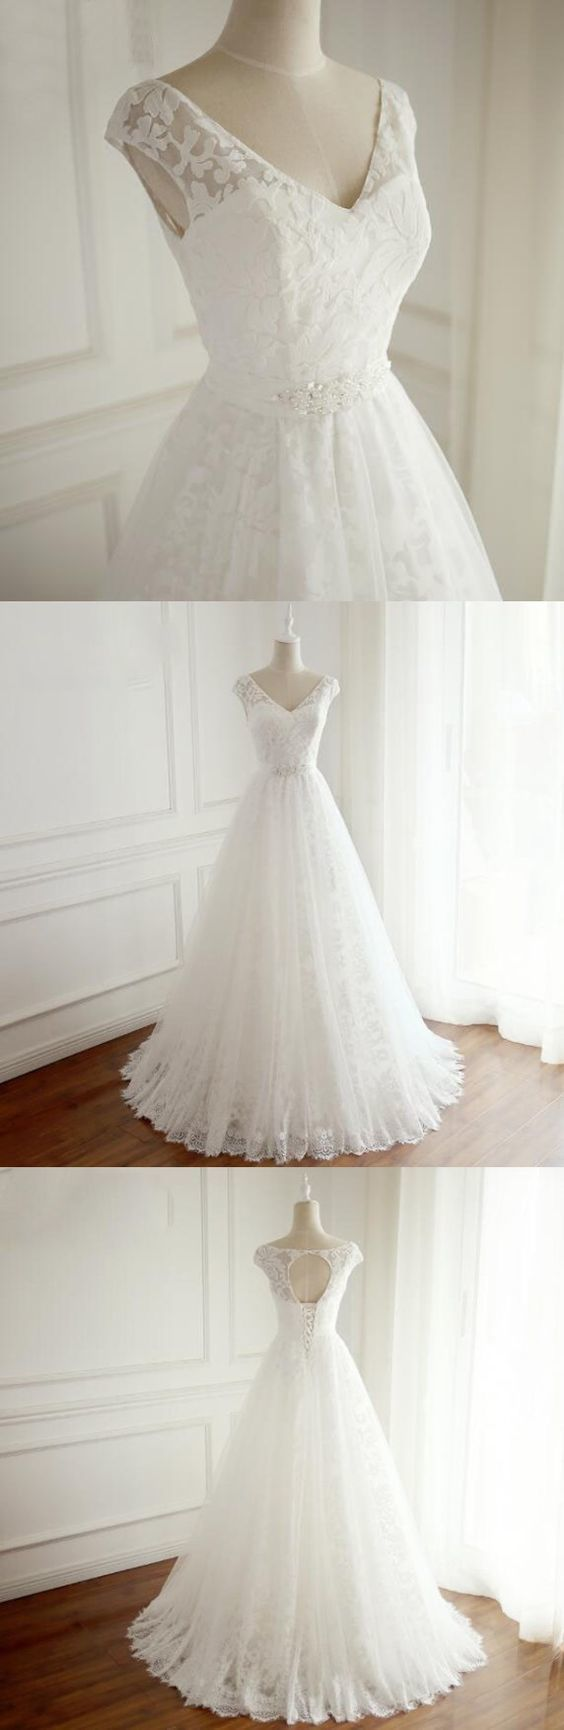 Copy of A-Line Sweetheart Sleeveless Wedding Dress ,Prom Dress, Simple Cheap Custom Prom Dresses